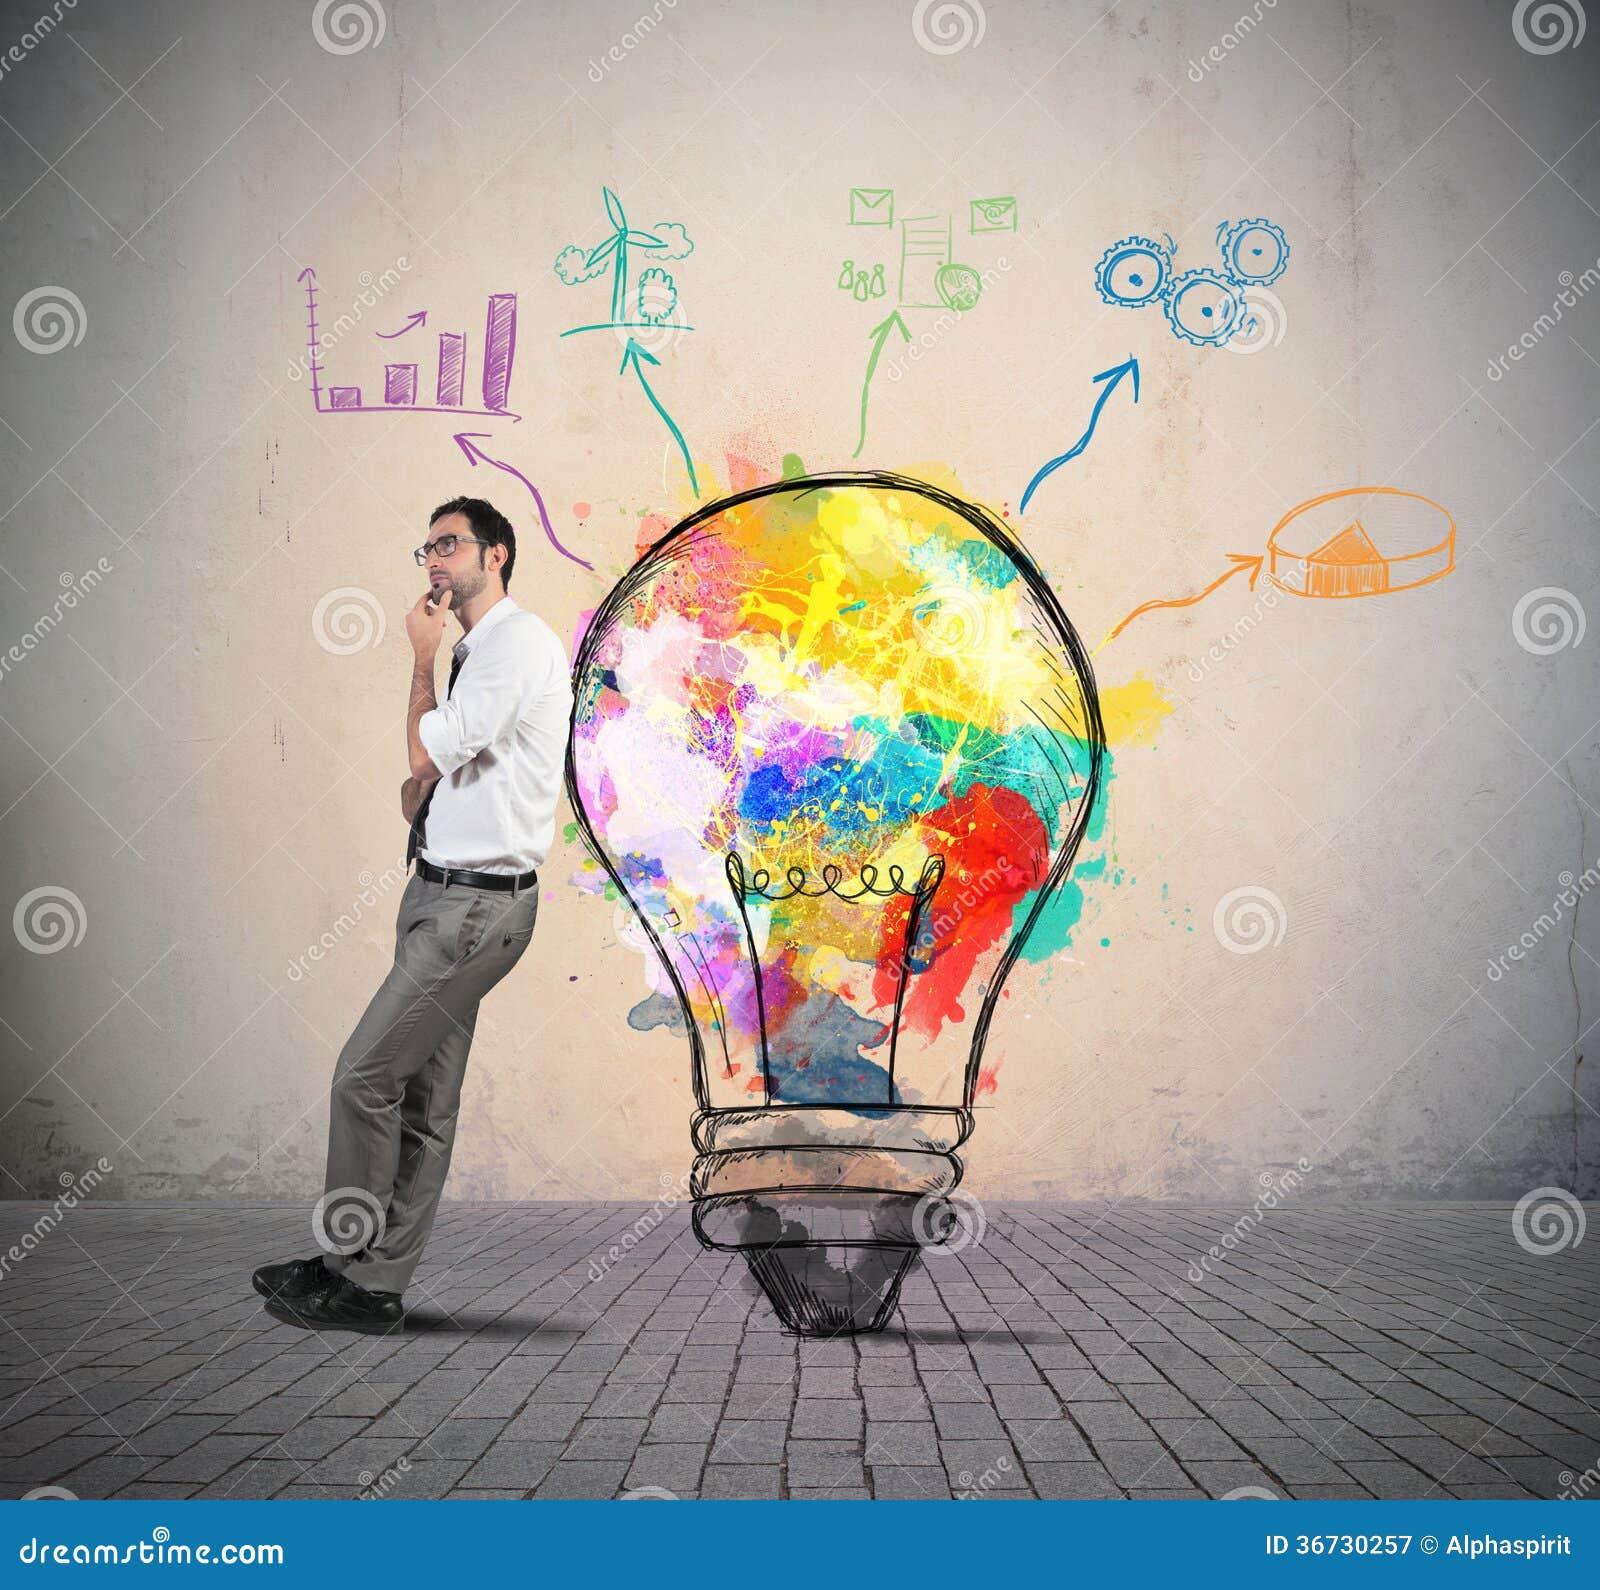 Creative Business Idea Royalty Free Stock Photography ...